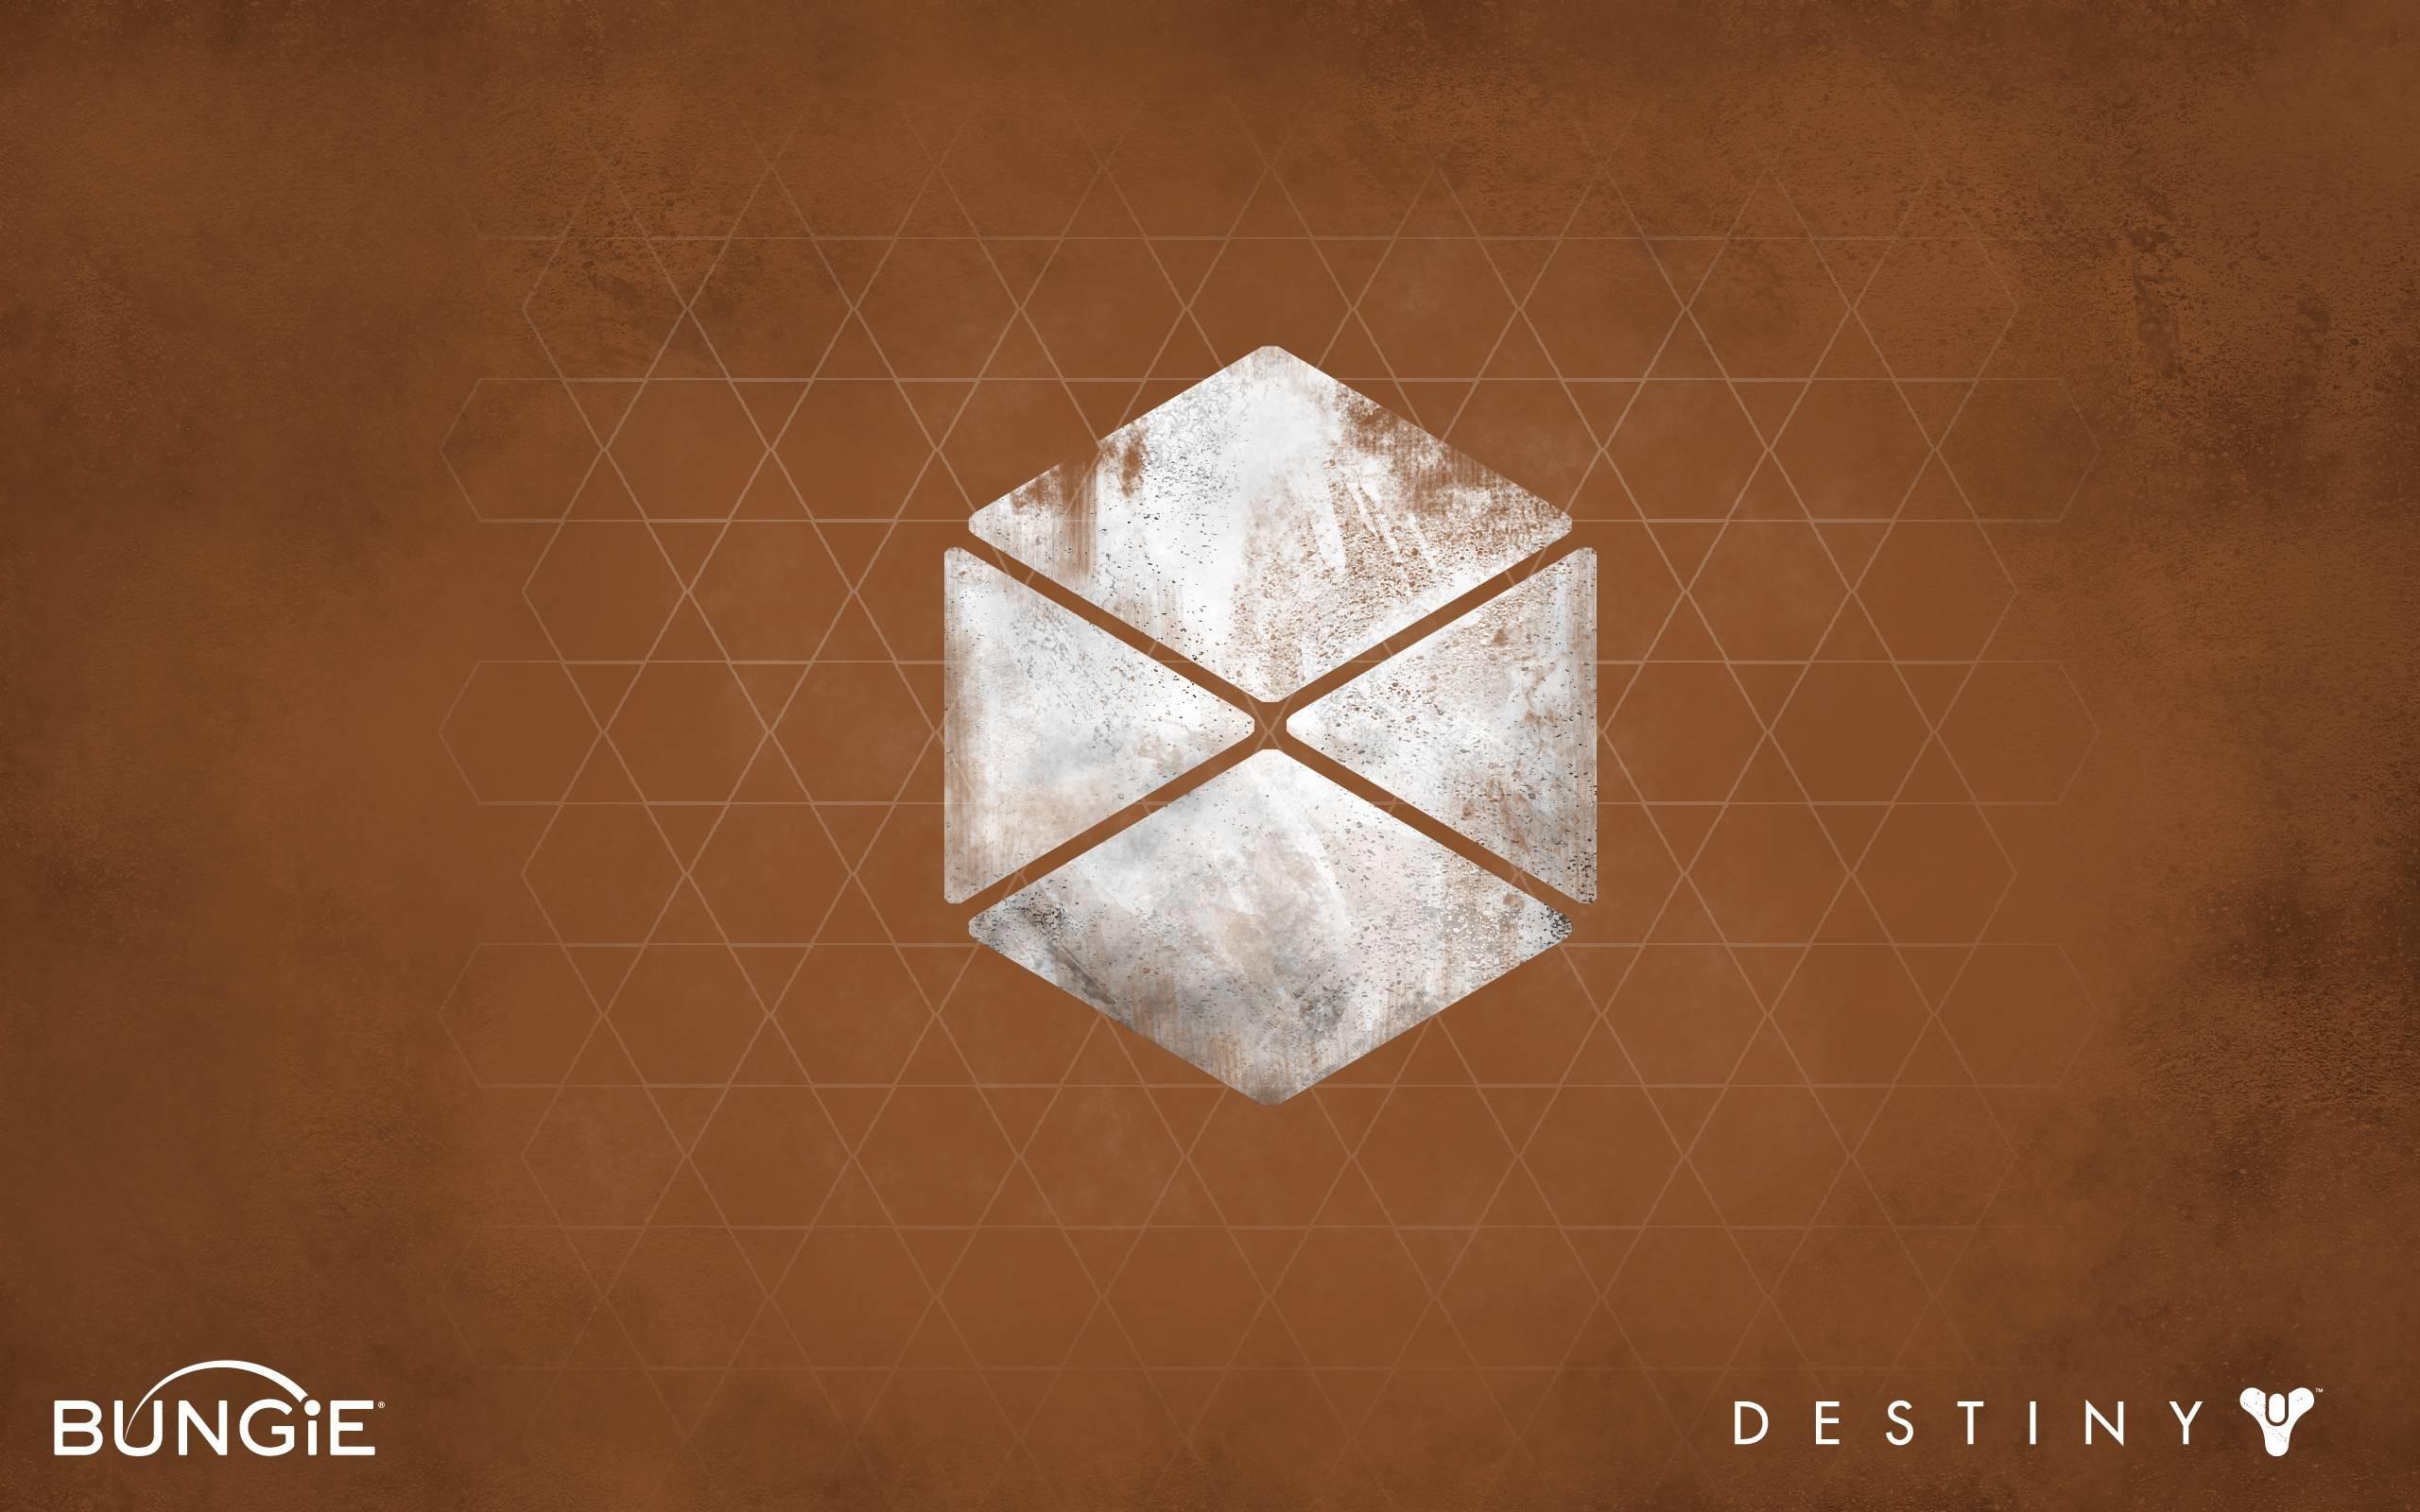 High Res Destiny's Wallpaper (2560×1600) > Destiny | Forums | Bungie.net